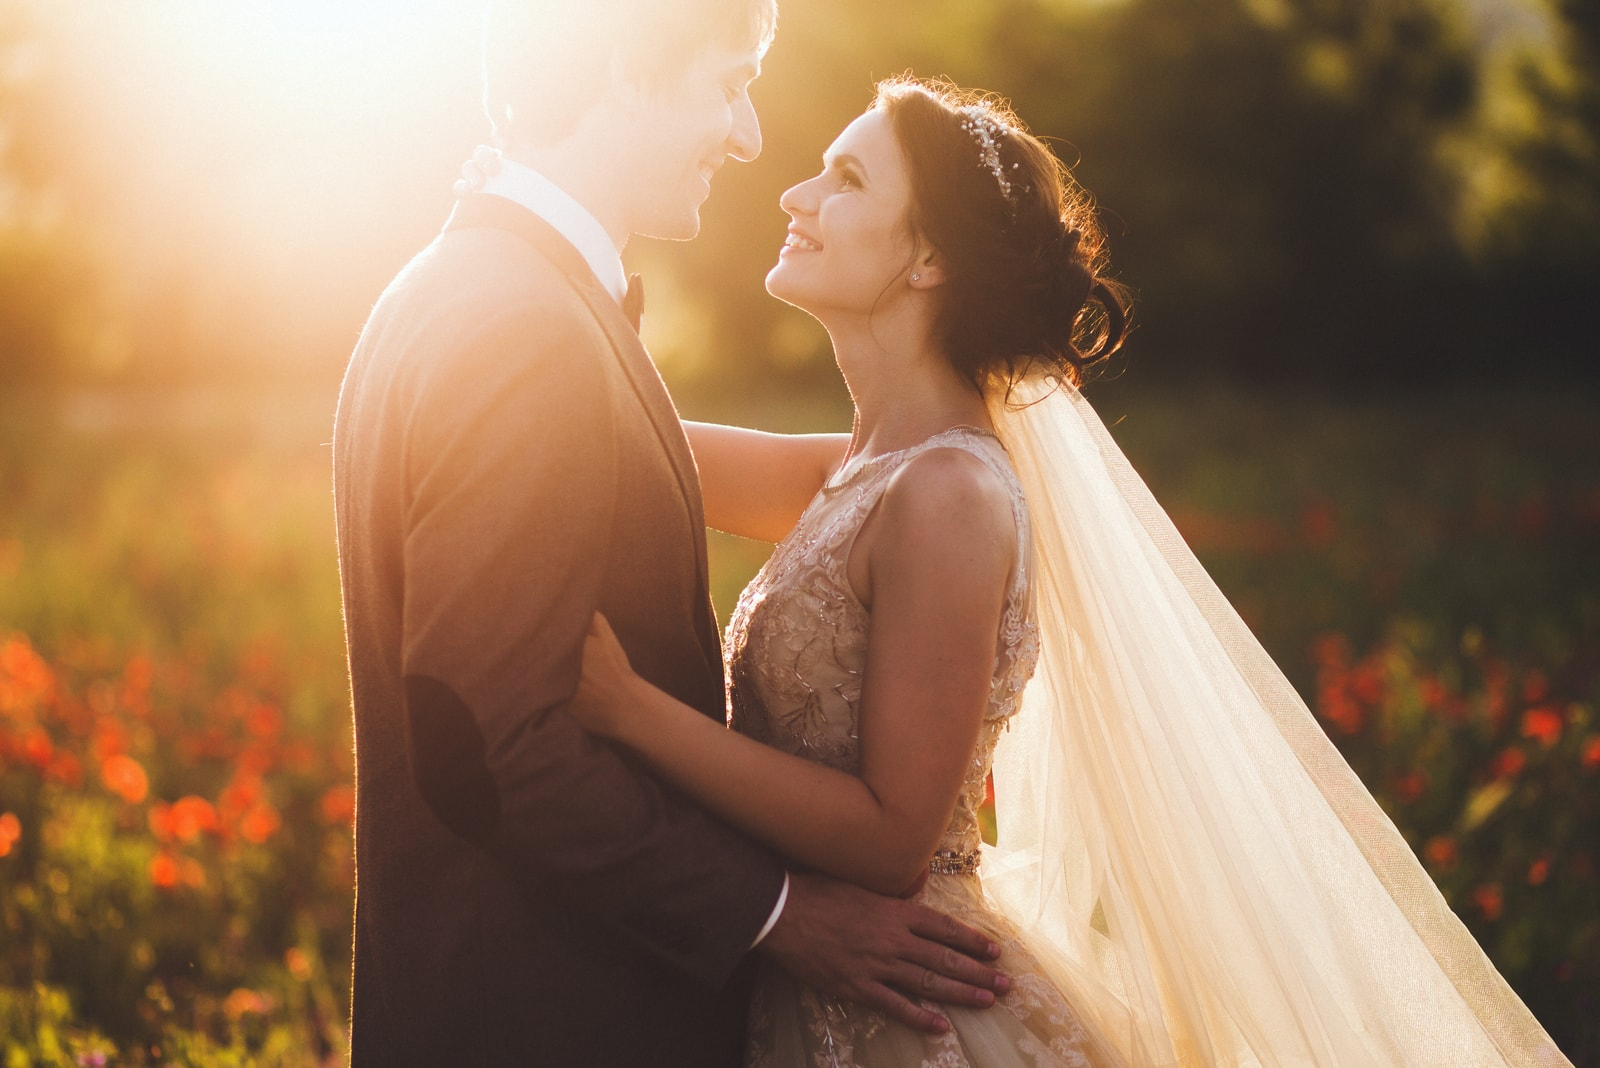 newlyweds in nature hug at sunset